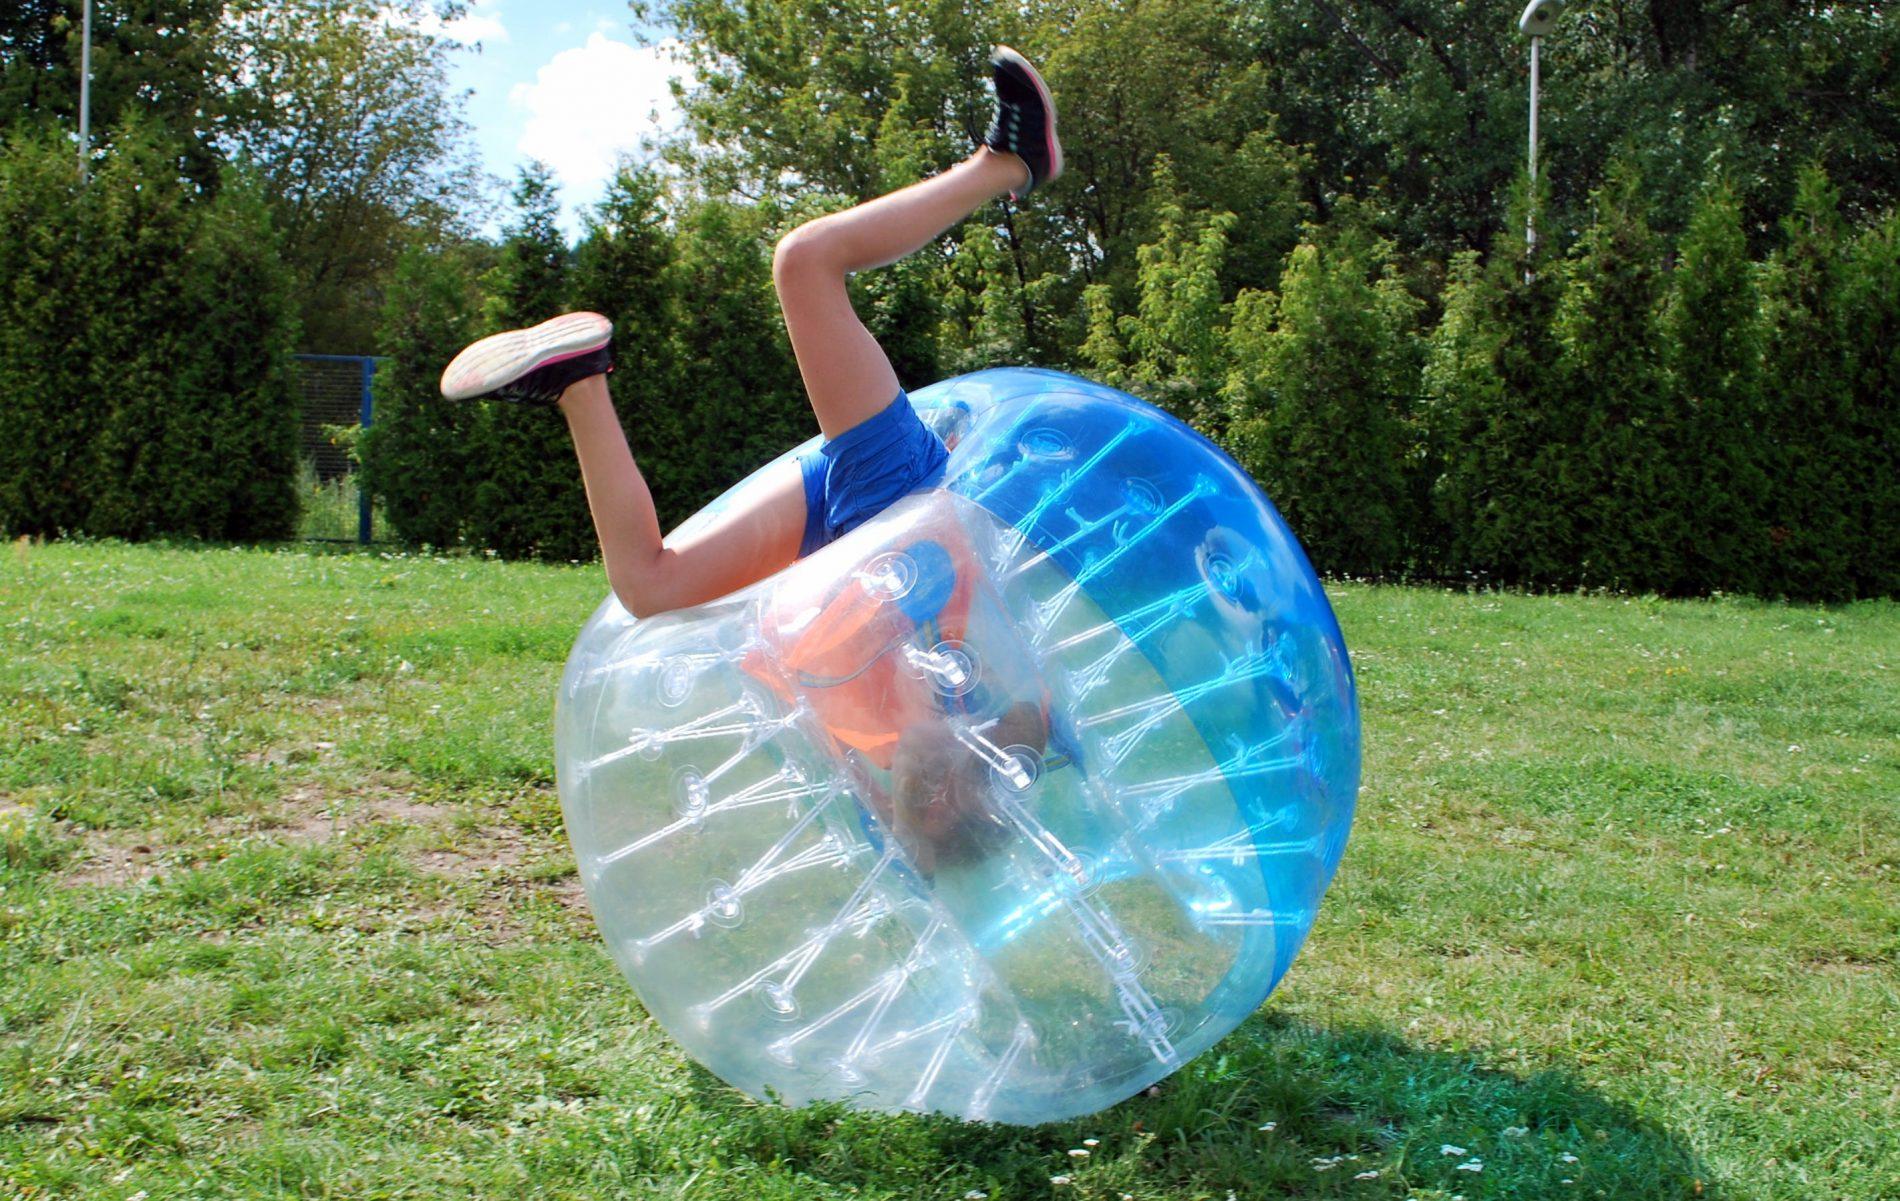 Salto w Bumper Ball podczas półkolonii 2times